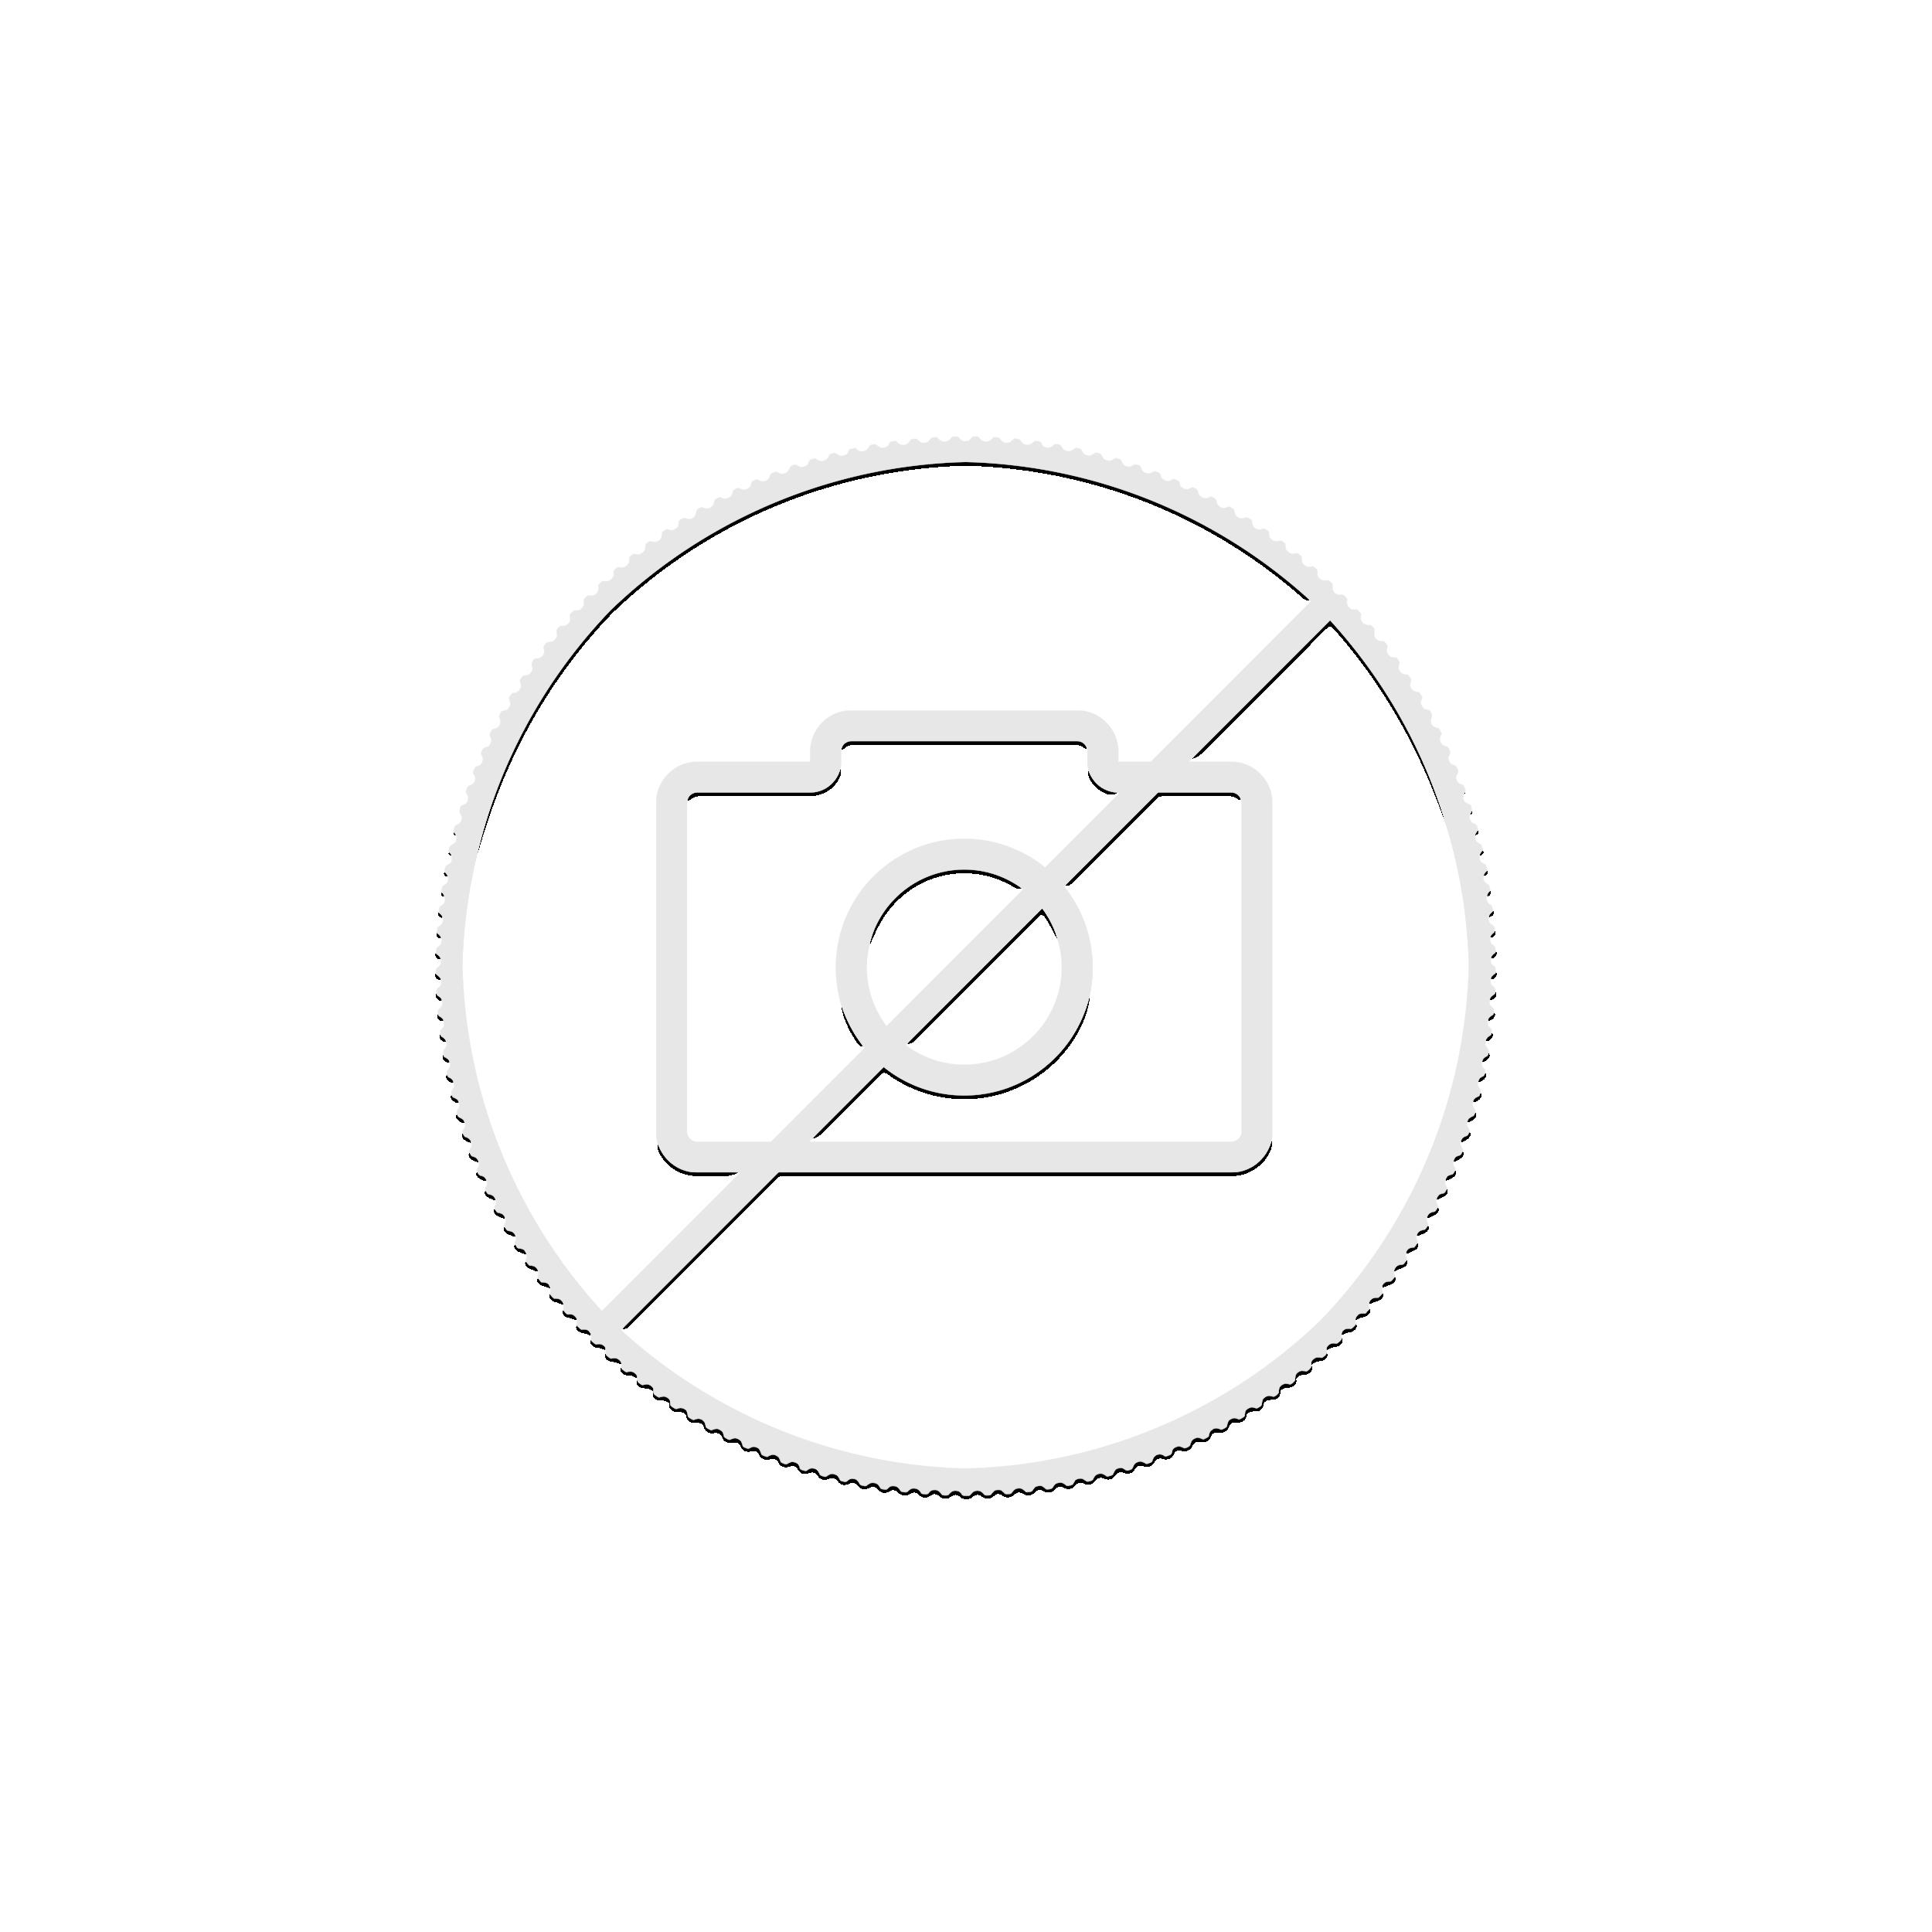 1/2 troy ounce zilveren munt Tasmaanse duivel - Dromen down under 2021 Proof